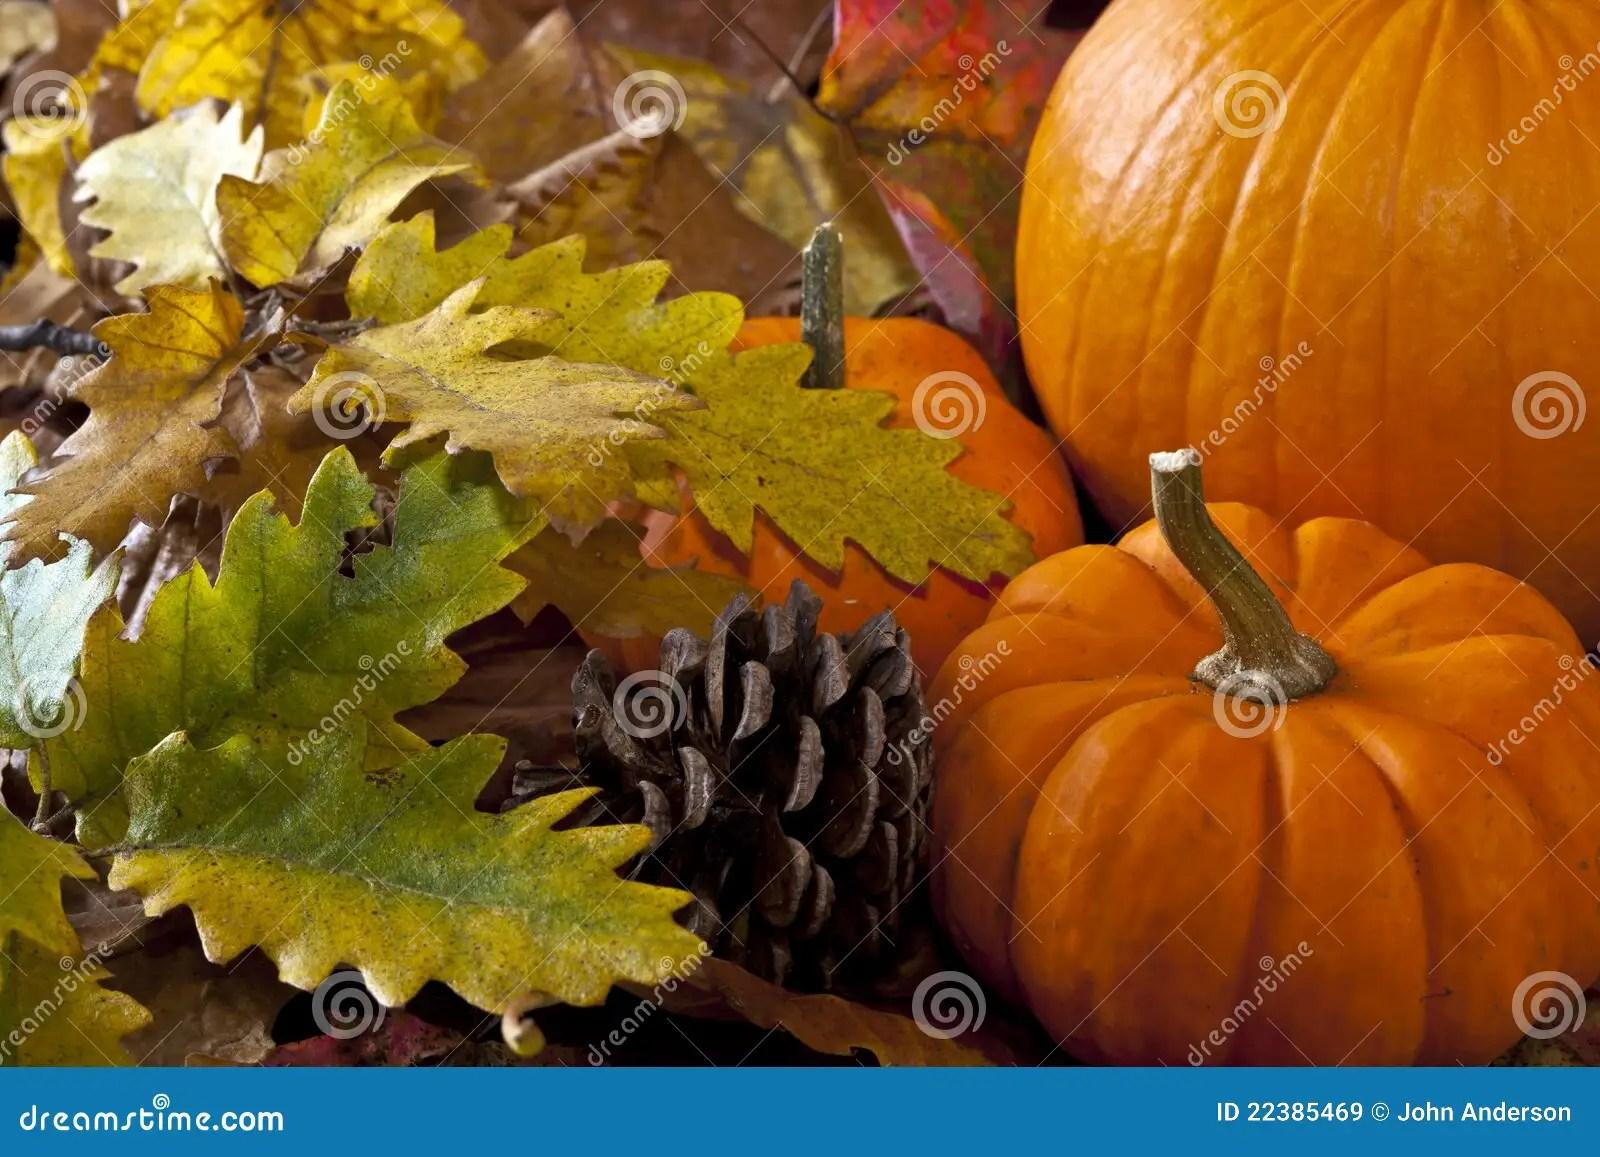 Fall Scenes Wallpaper With Pumpkins Autumn Scene With Pumpkins Stock Image Image Of Fall